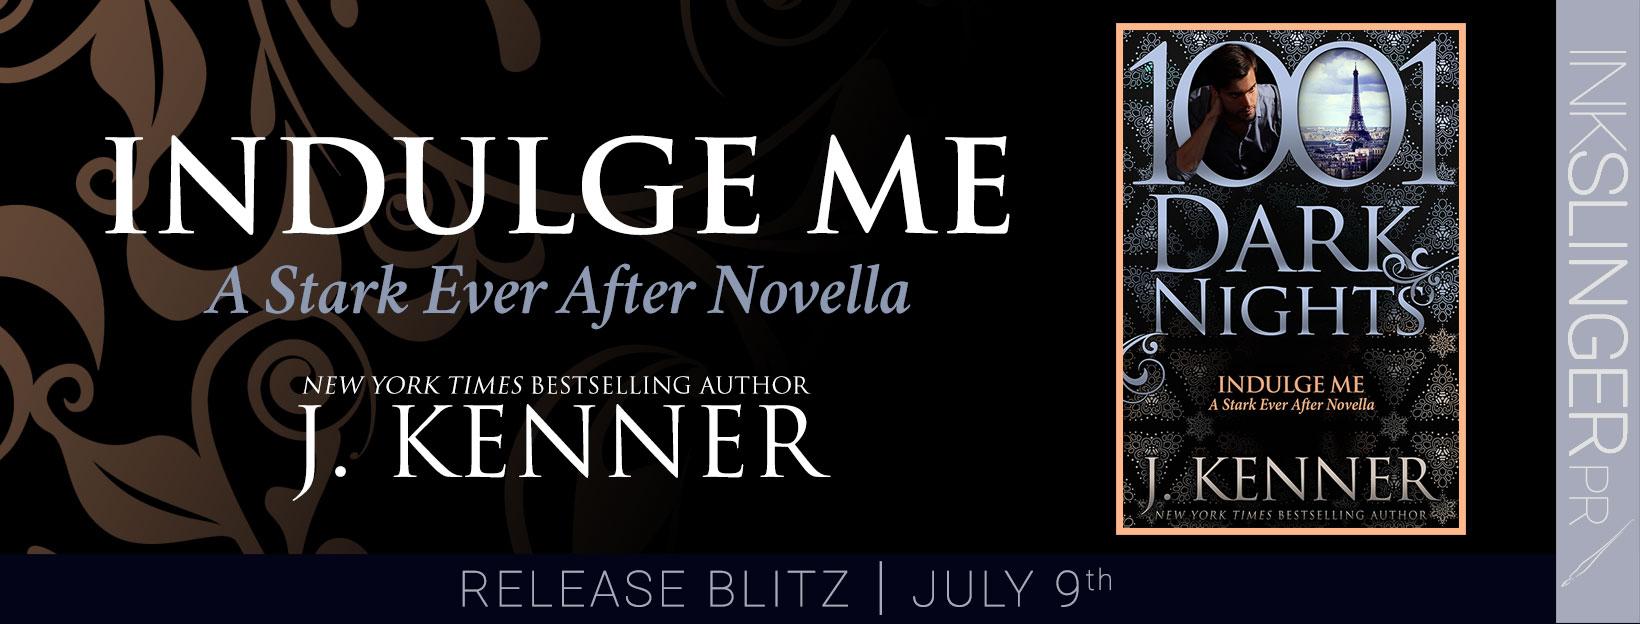 Release Blitz:  Indulge Me (Stark Saga #6.1) by J. Kenner